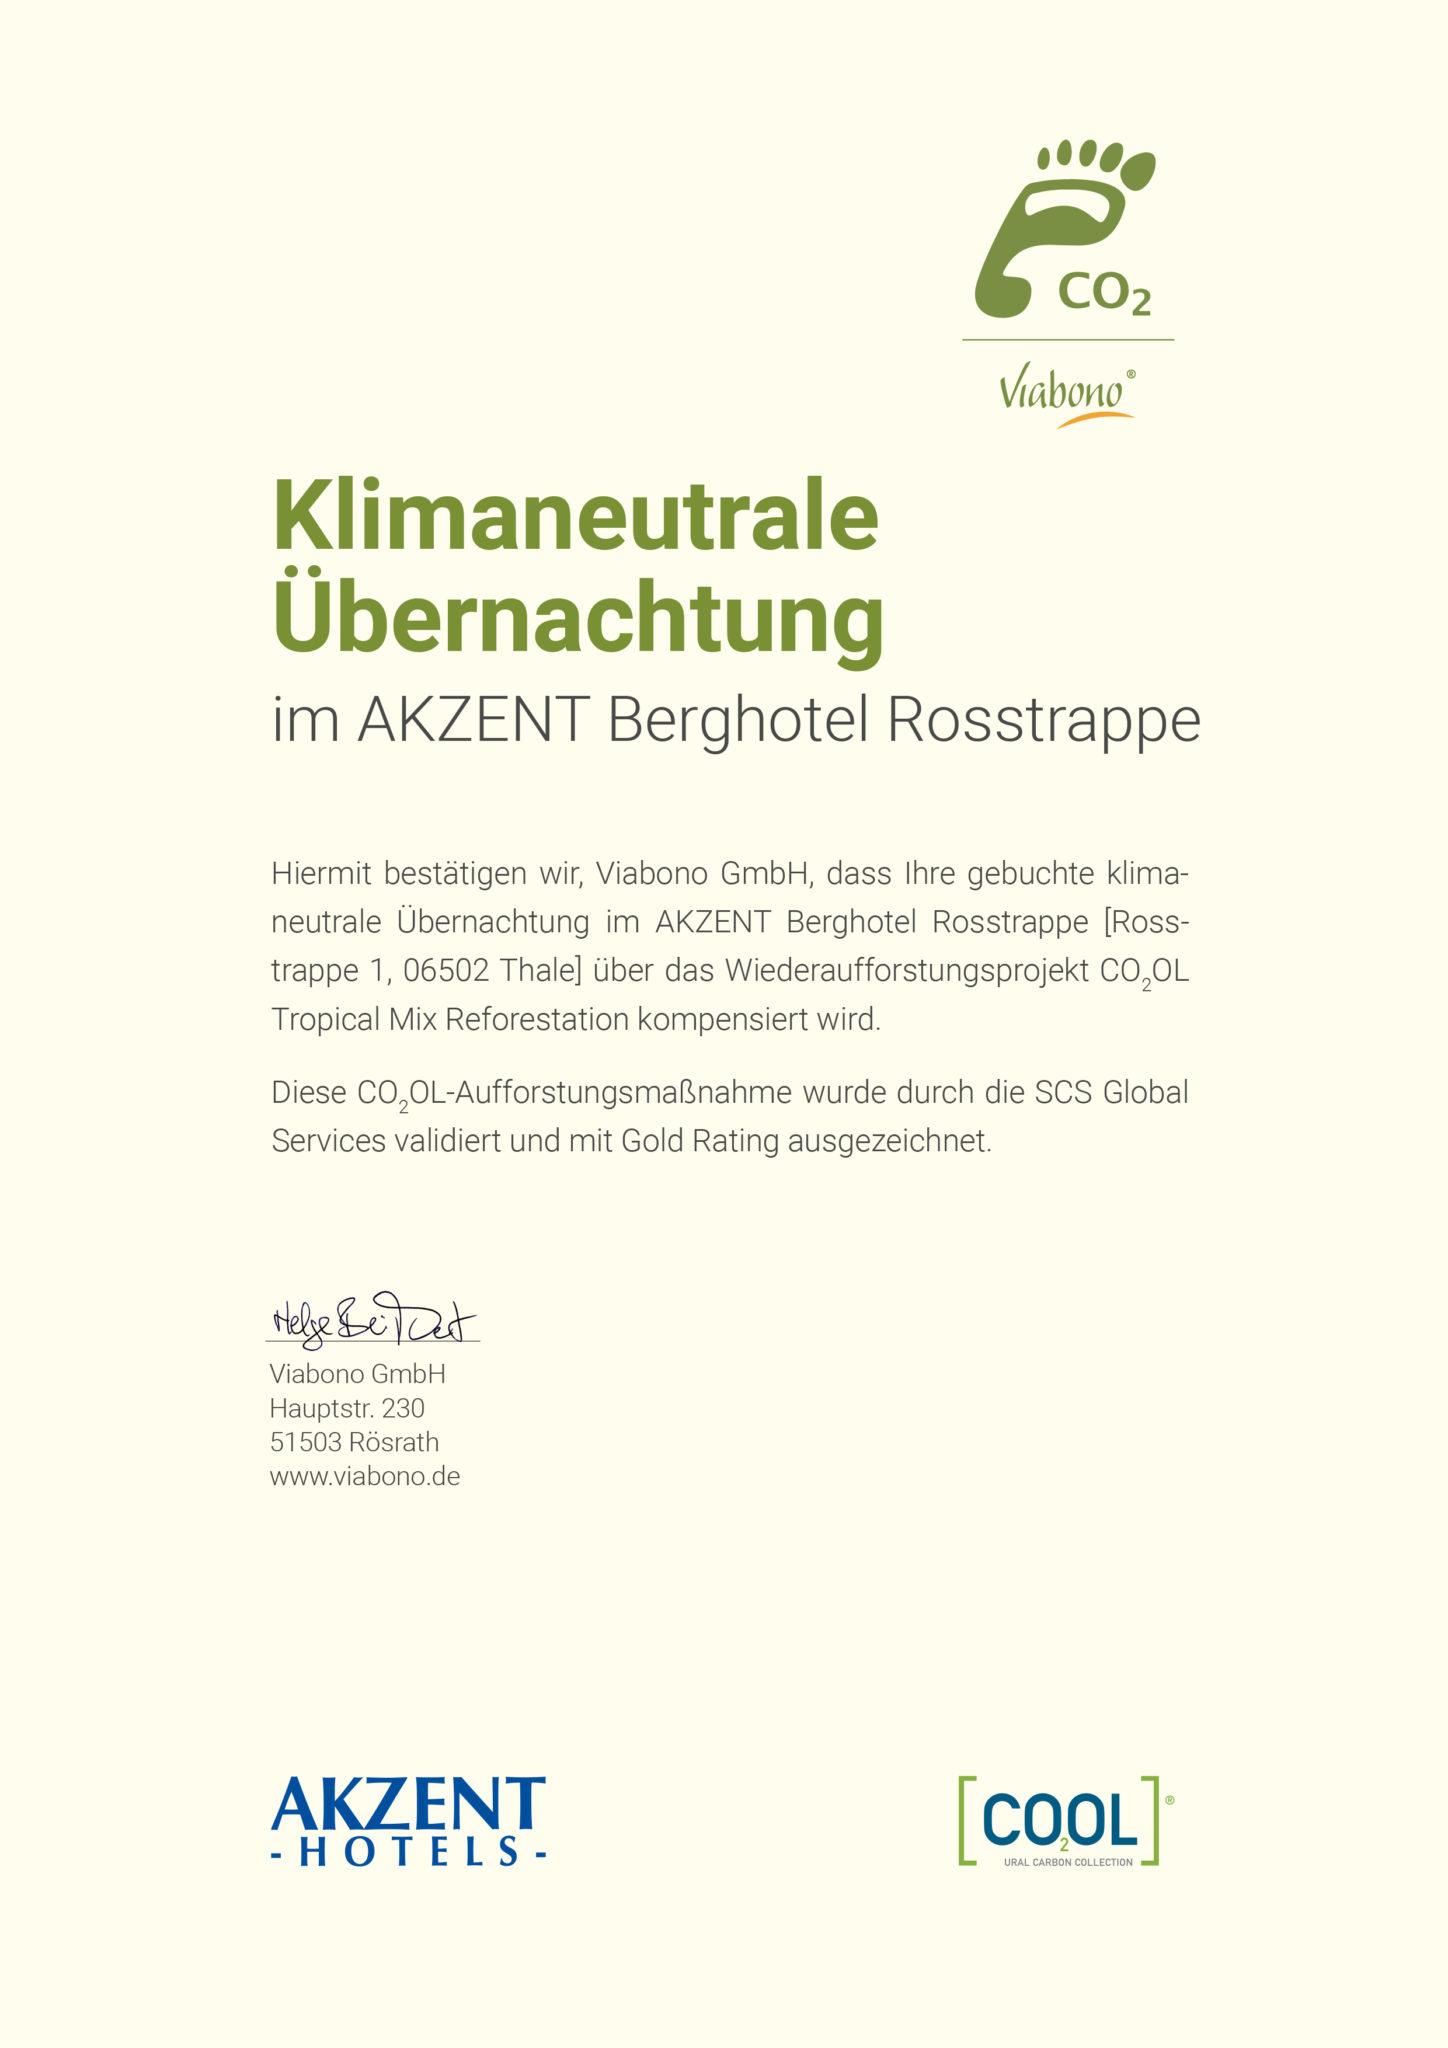 Zertifikat_klimaneutraleUebernachtung_Rosstrappe_032018